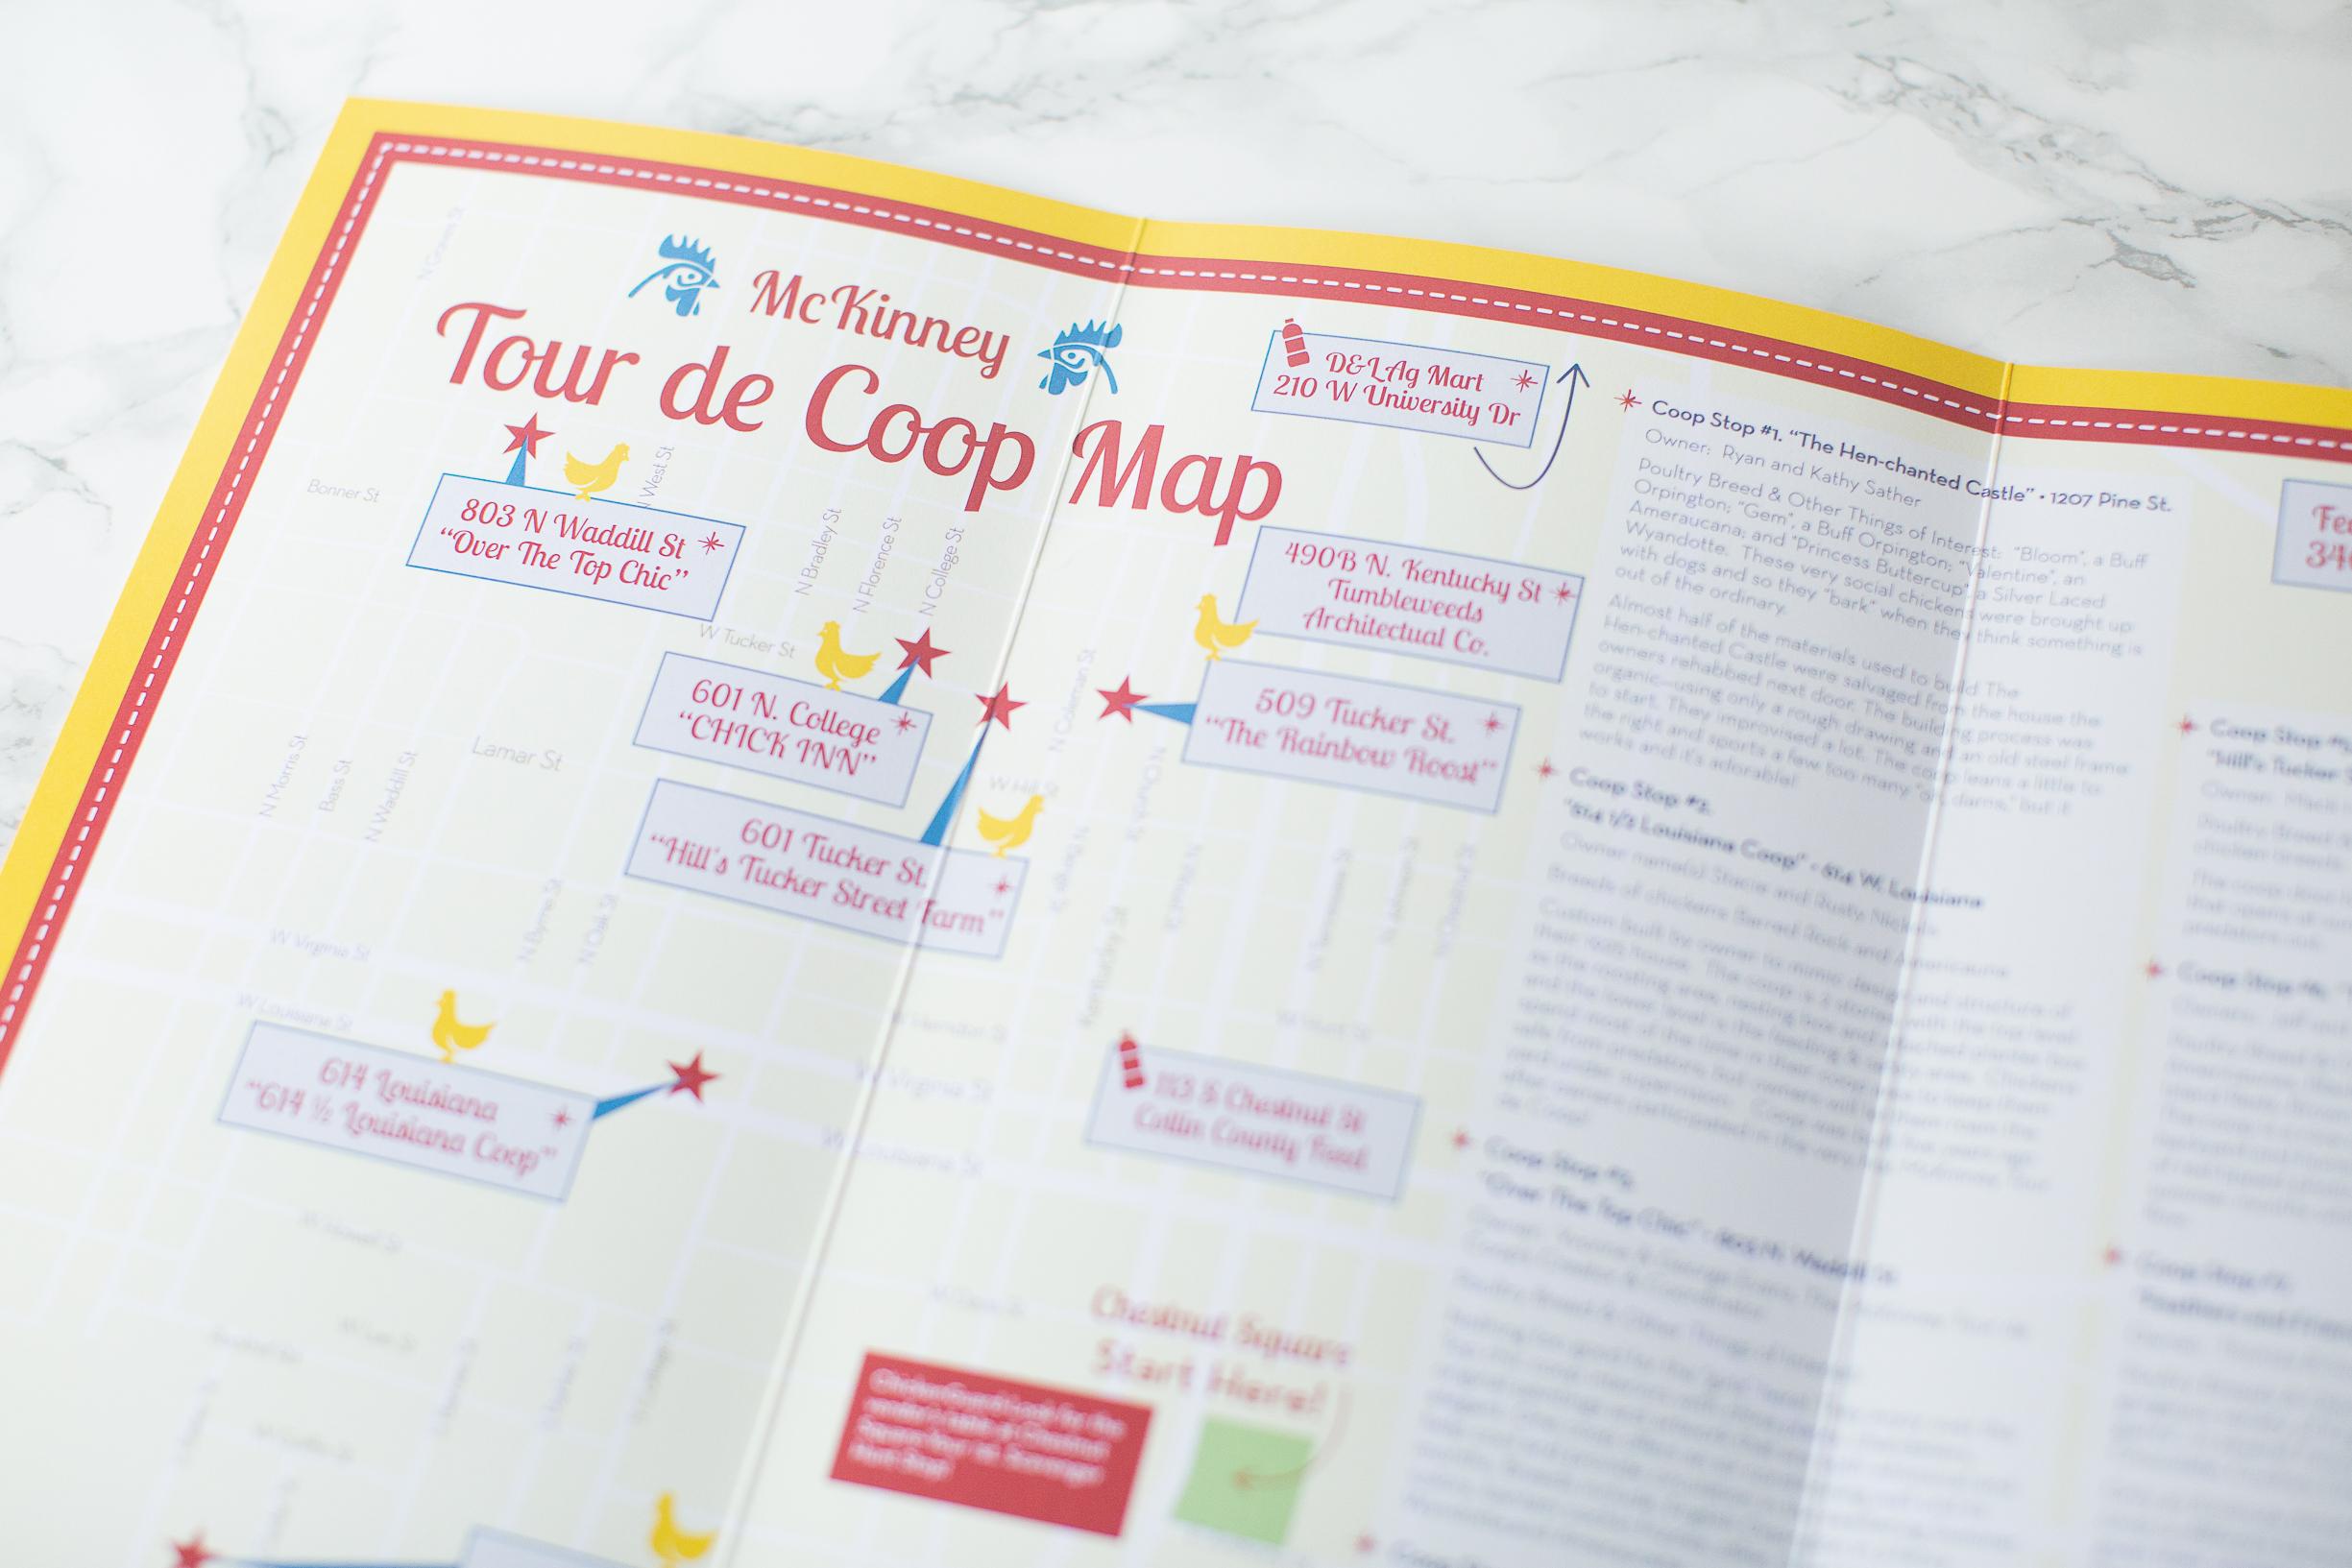 McKinney, Texas Tour de Coop Map The Map Chick